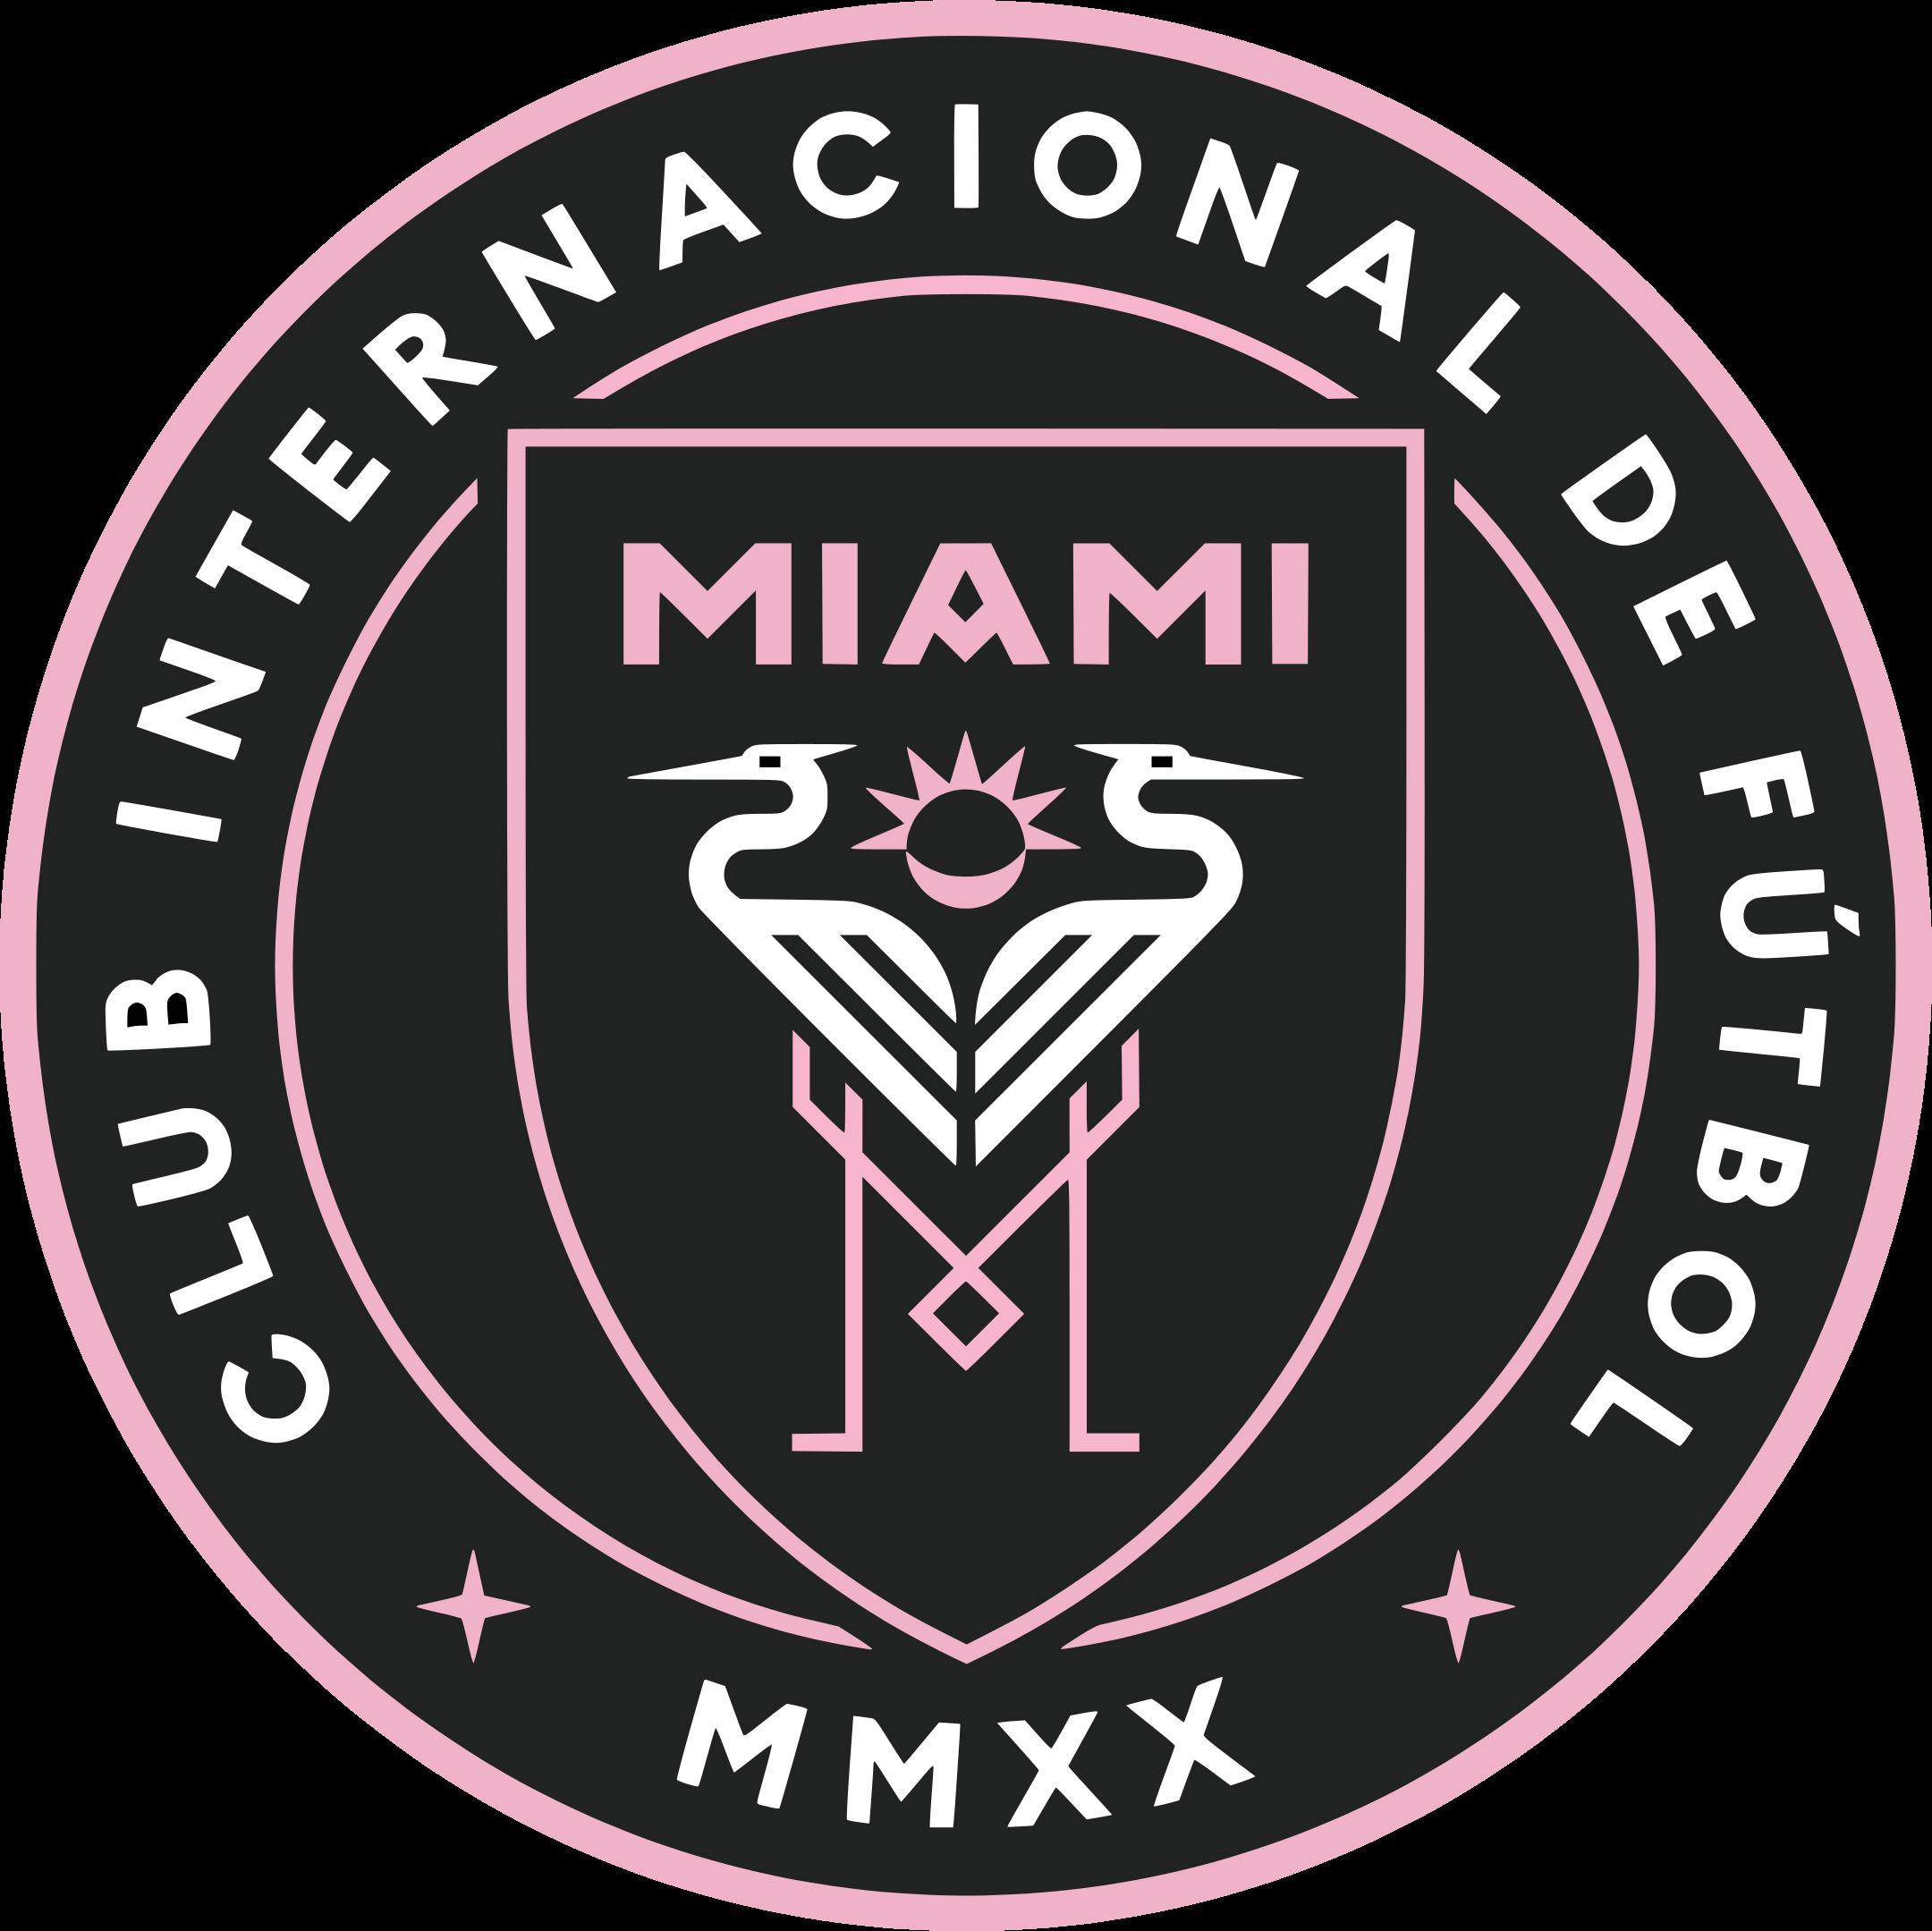 Inter miami cf logo 1 - Inter Miami CF Logo